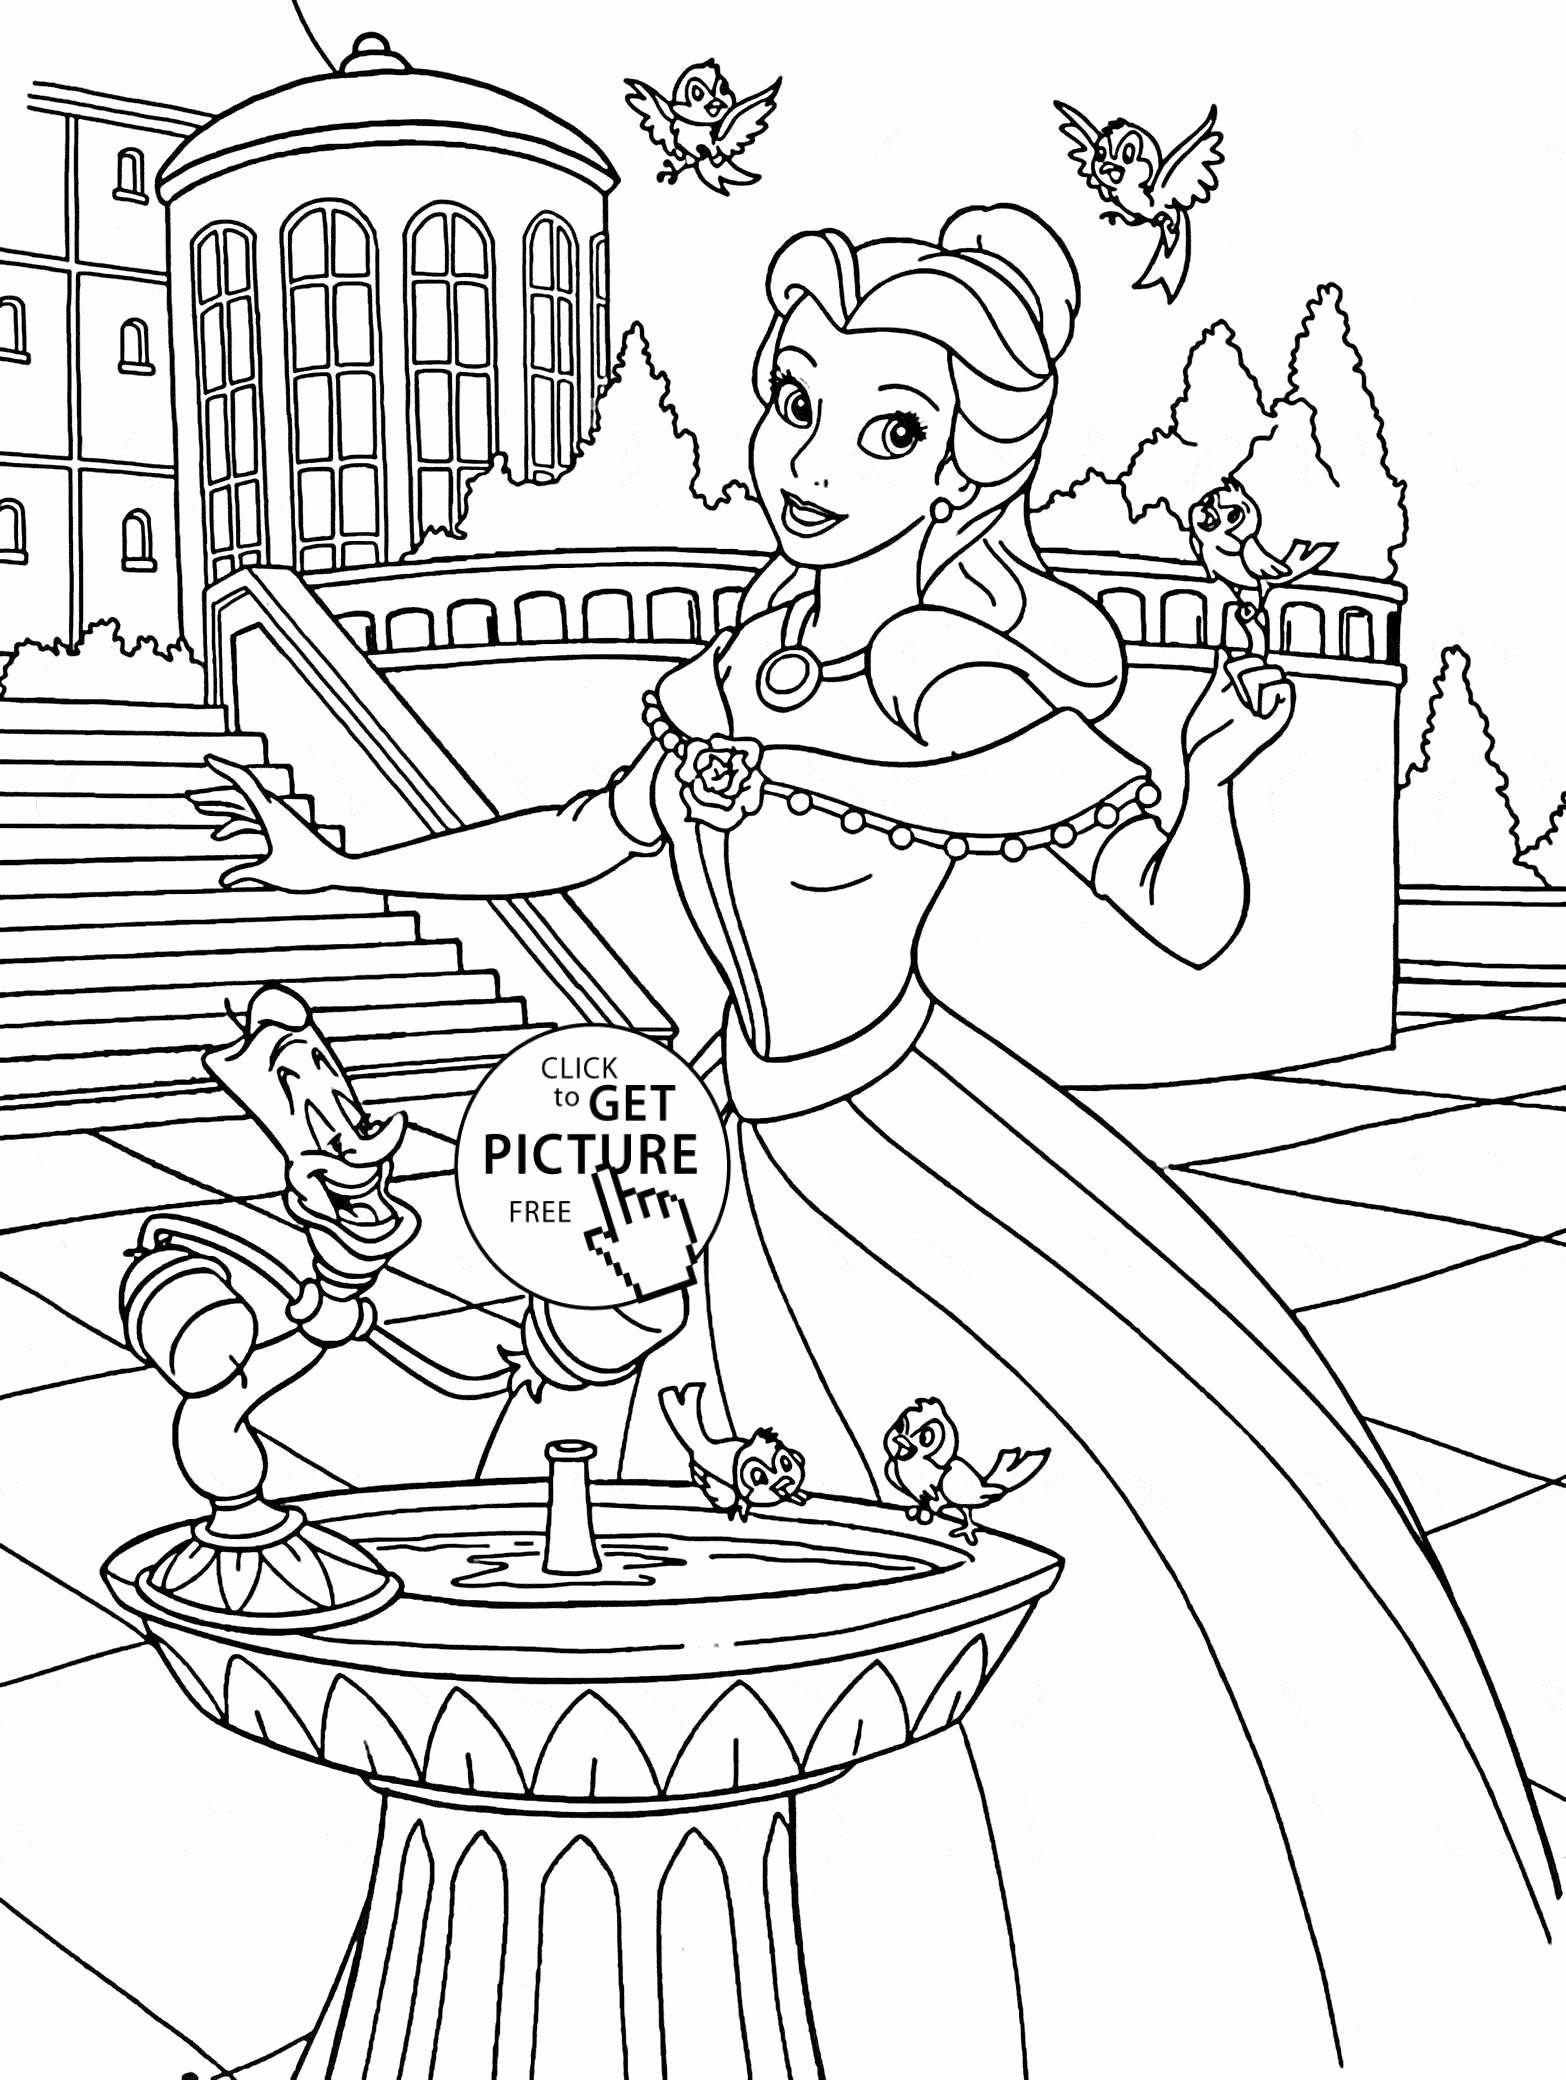 Princess Coloring Sheets Printable Best Of 40 Inspirational Princess Colouring Games Buku Mewarnai Disney Warna